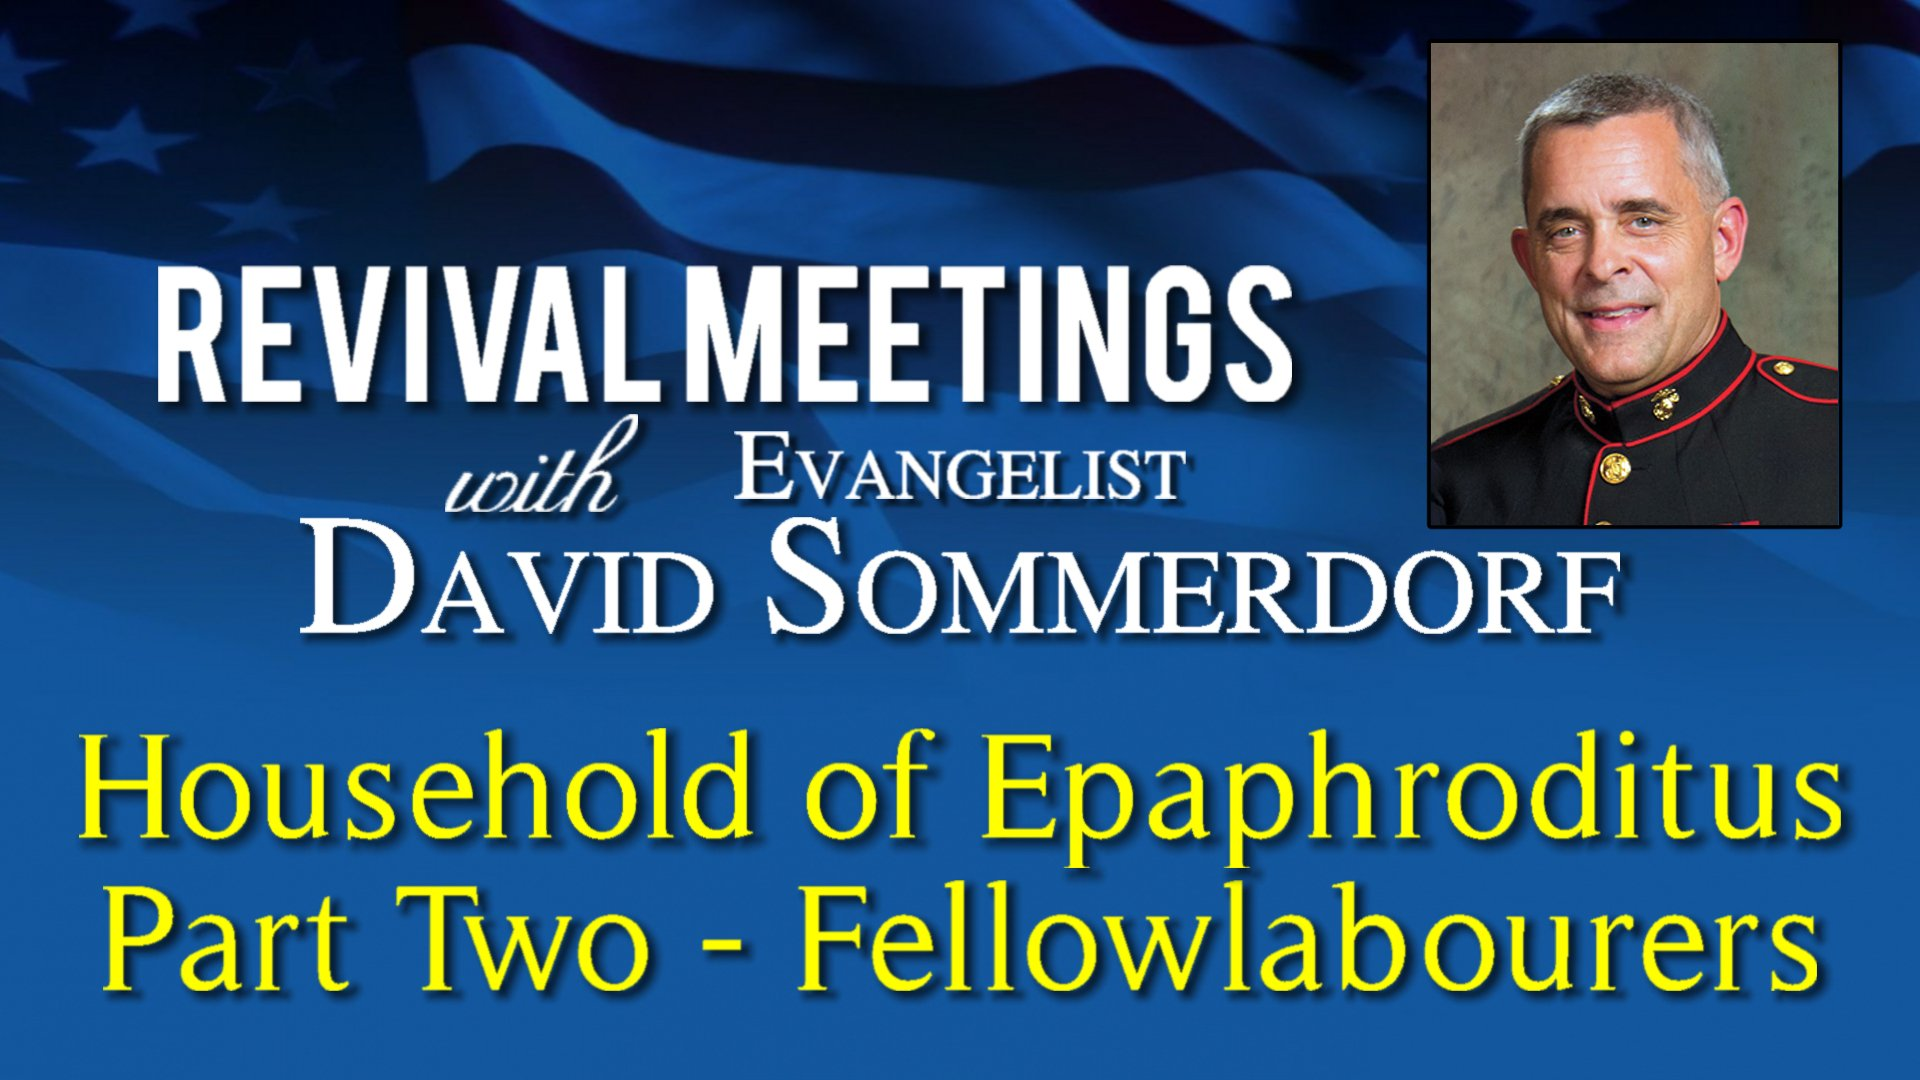 Household of Epaphroditus – Part 2 Fellow Labourers